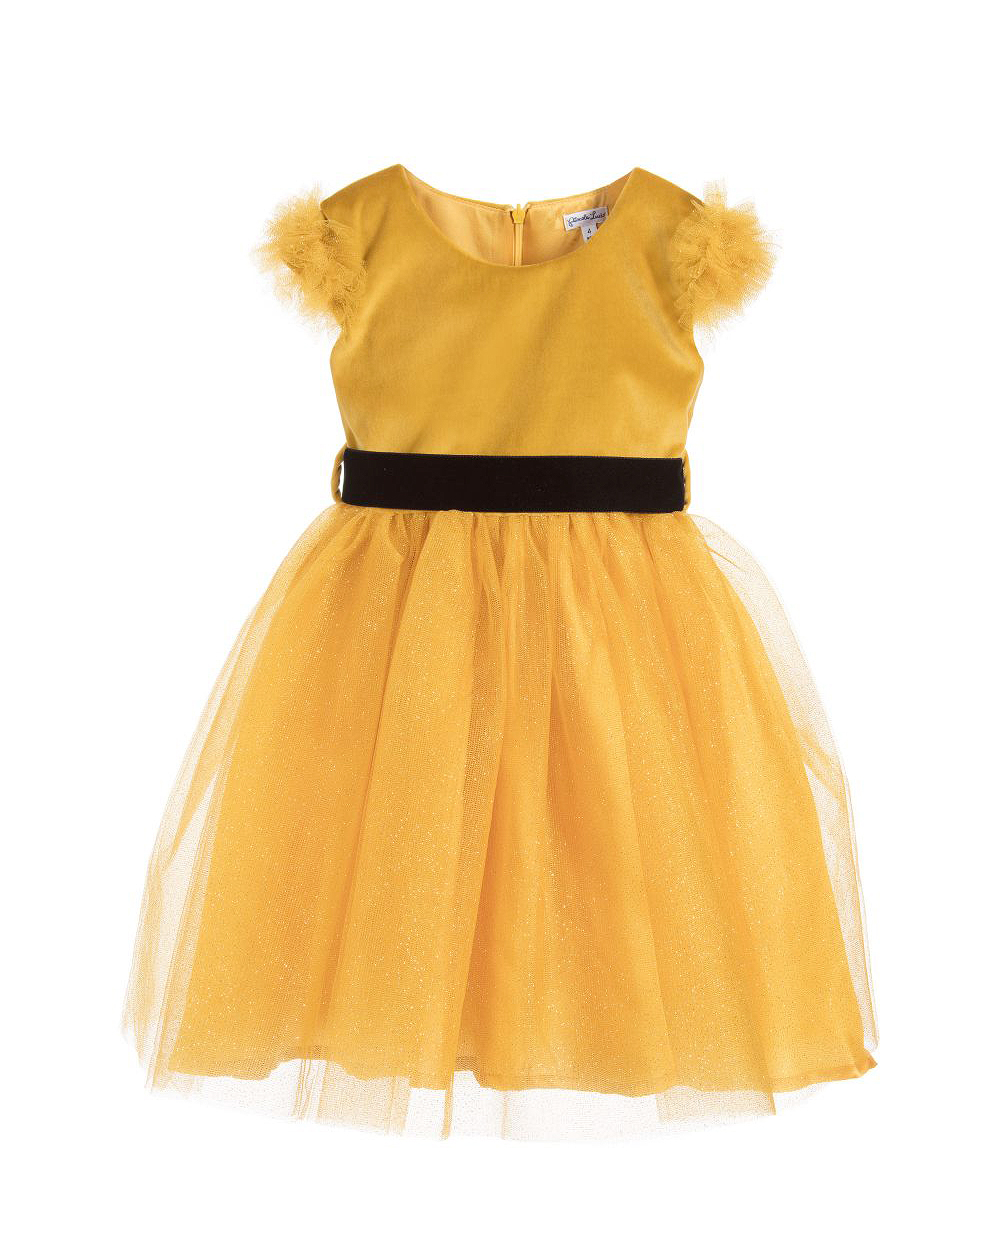 yellow flower girl dress black bow